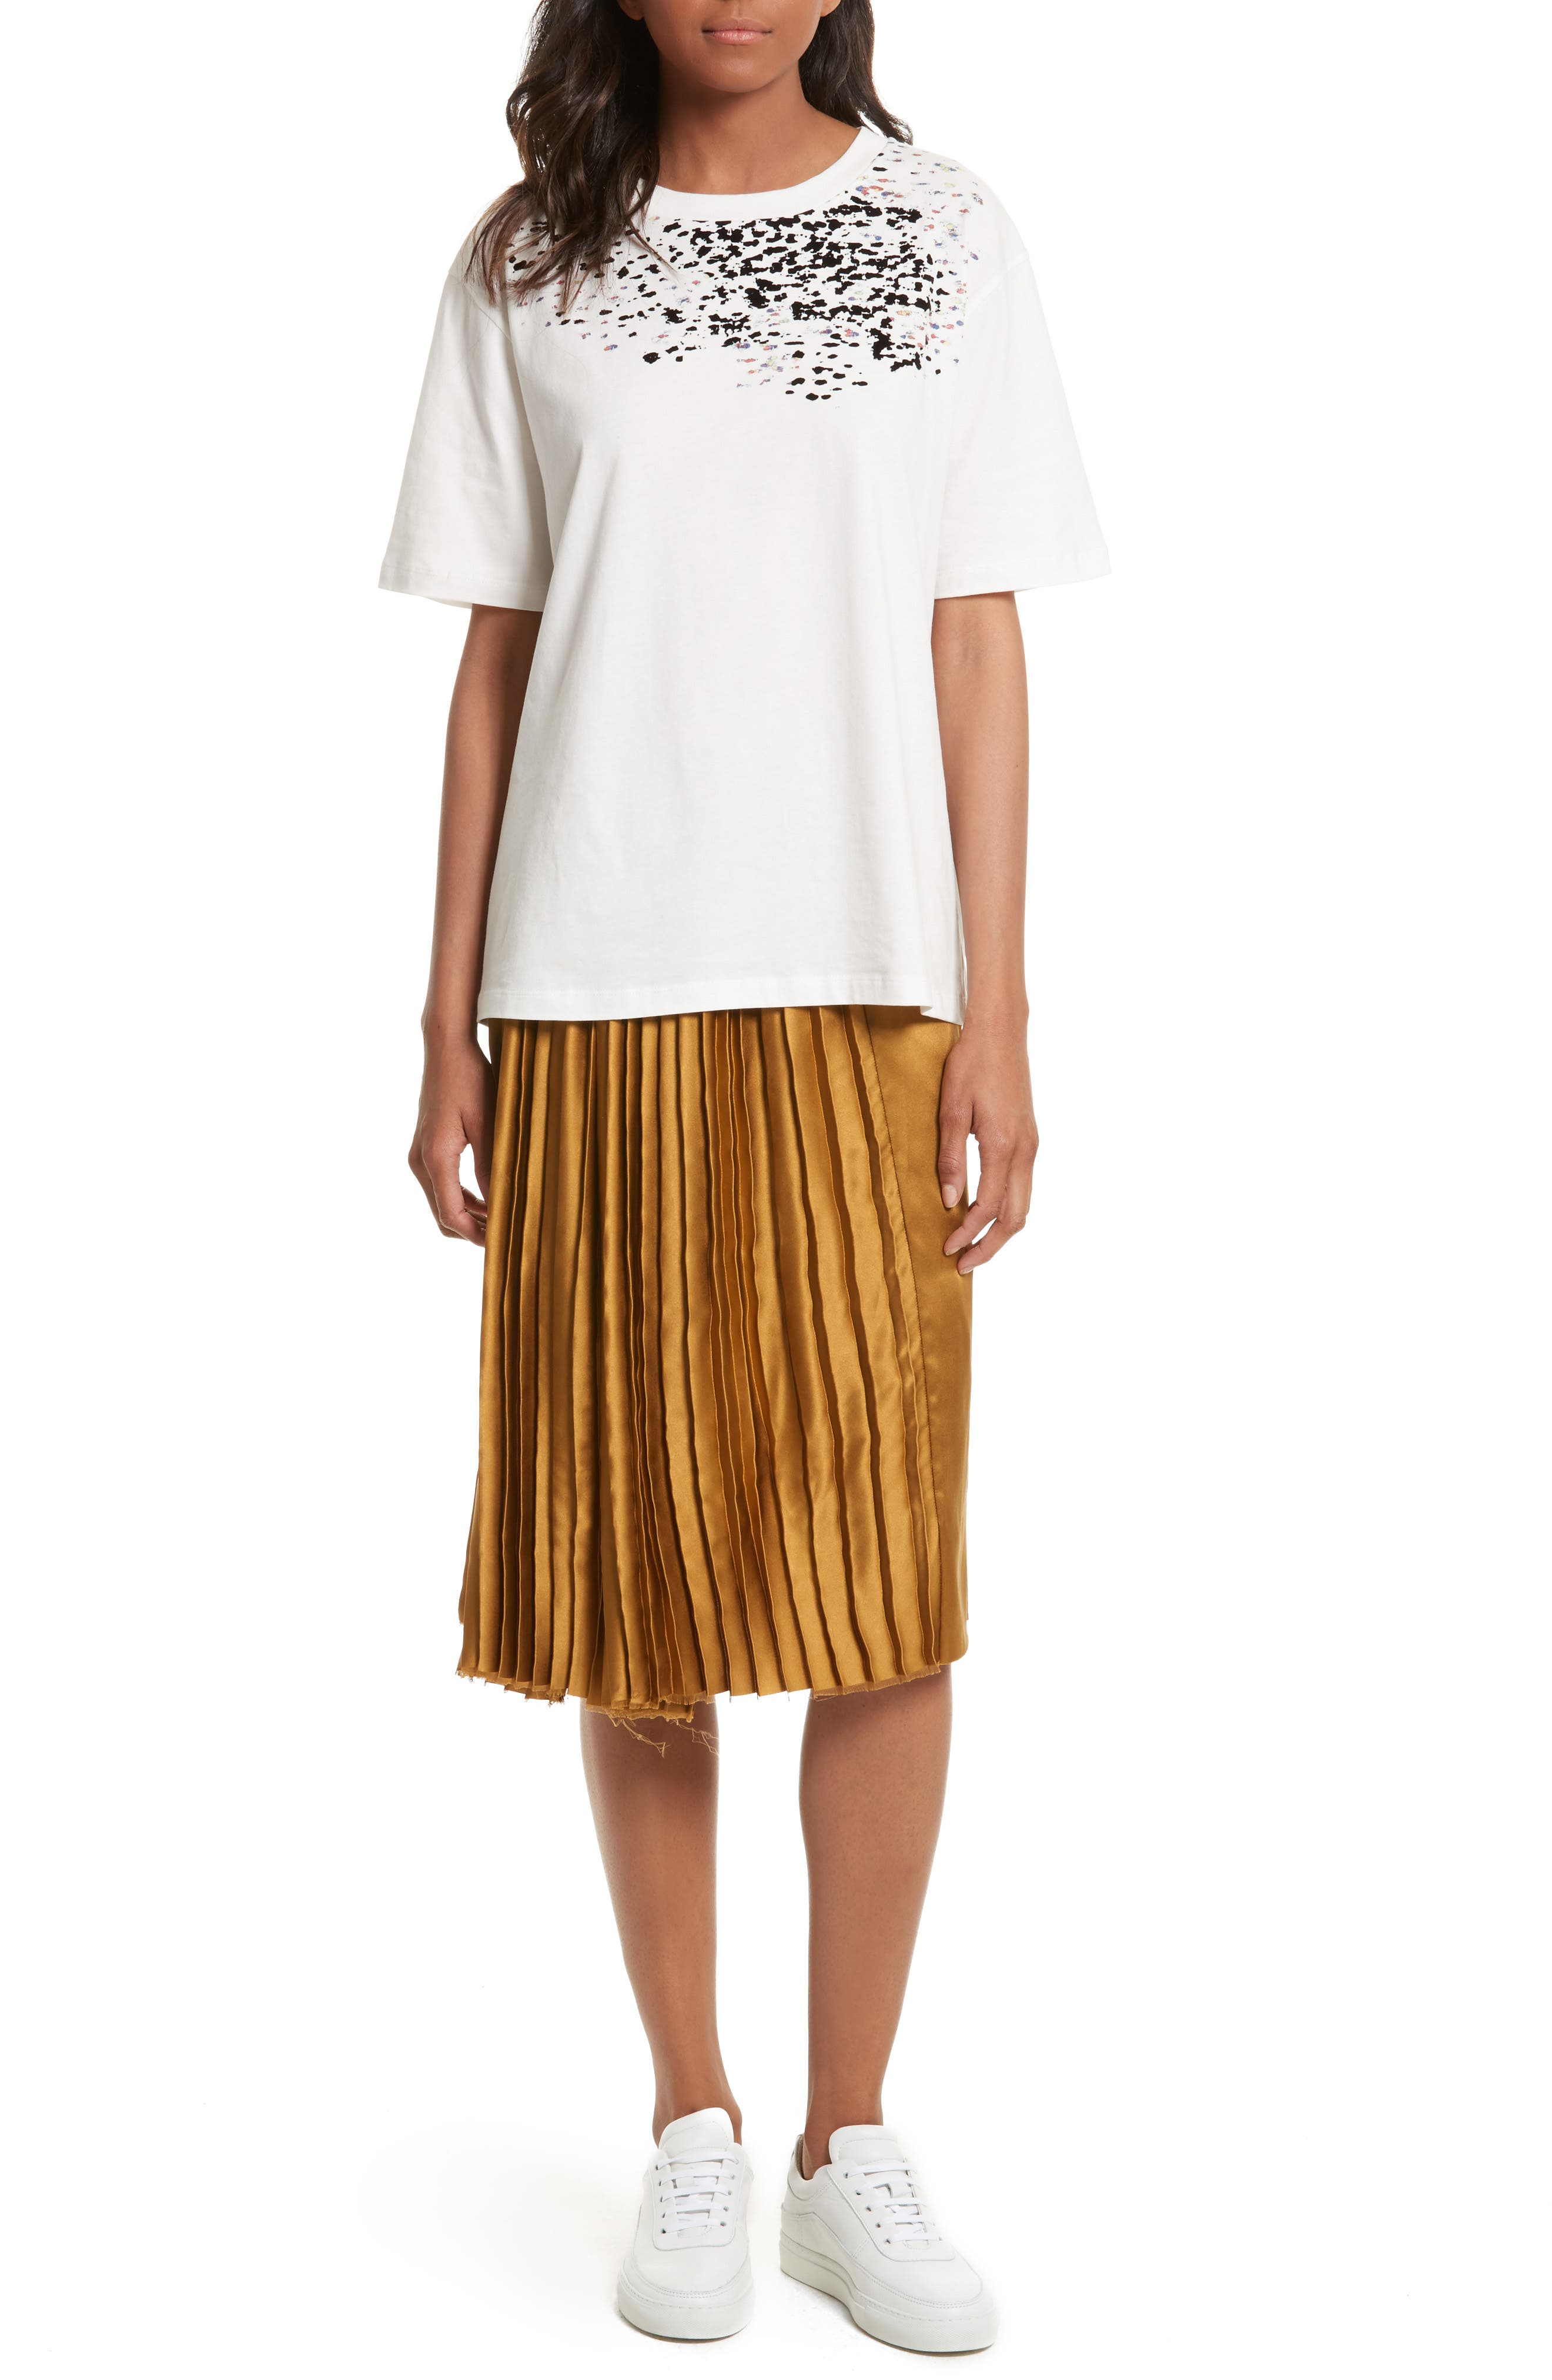 PUBLIC SCHOOL,                             Gamil Pleated Silk Skirt,                             Alternate thumbnail 6, color,                             200